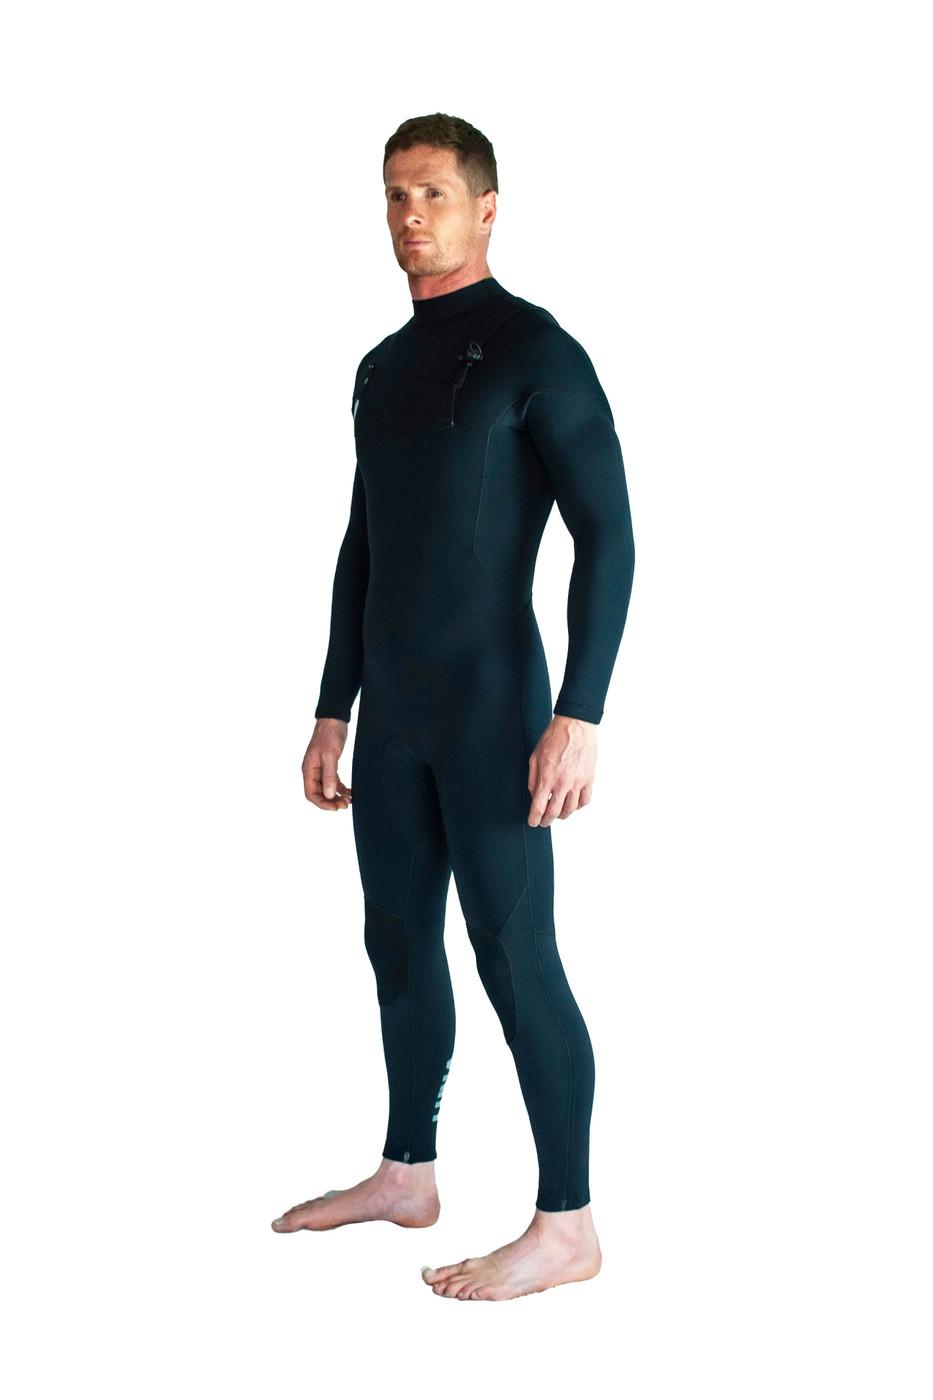 Lunasurf Mens 3.2mm Slant Zip Black Wetsuit